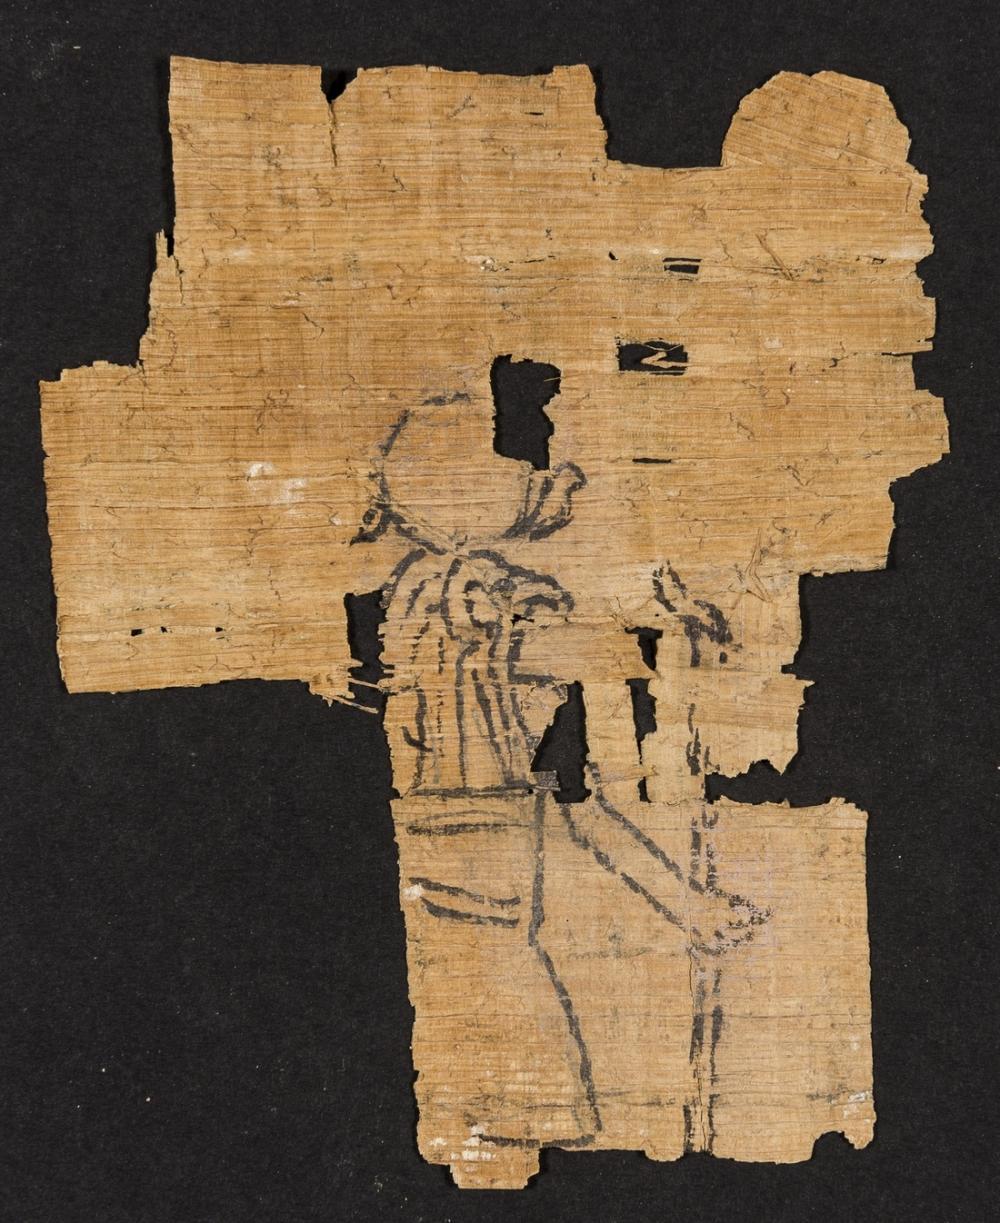 Horus.- Egyptian papyrus, depicting the god Horus, on a fragment of papyrus, [Egypt], [c. 1500 - 1200BCE].